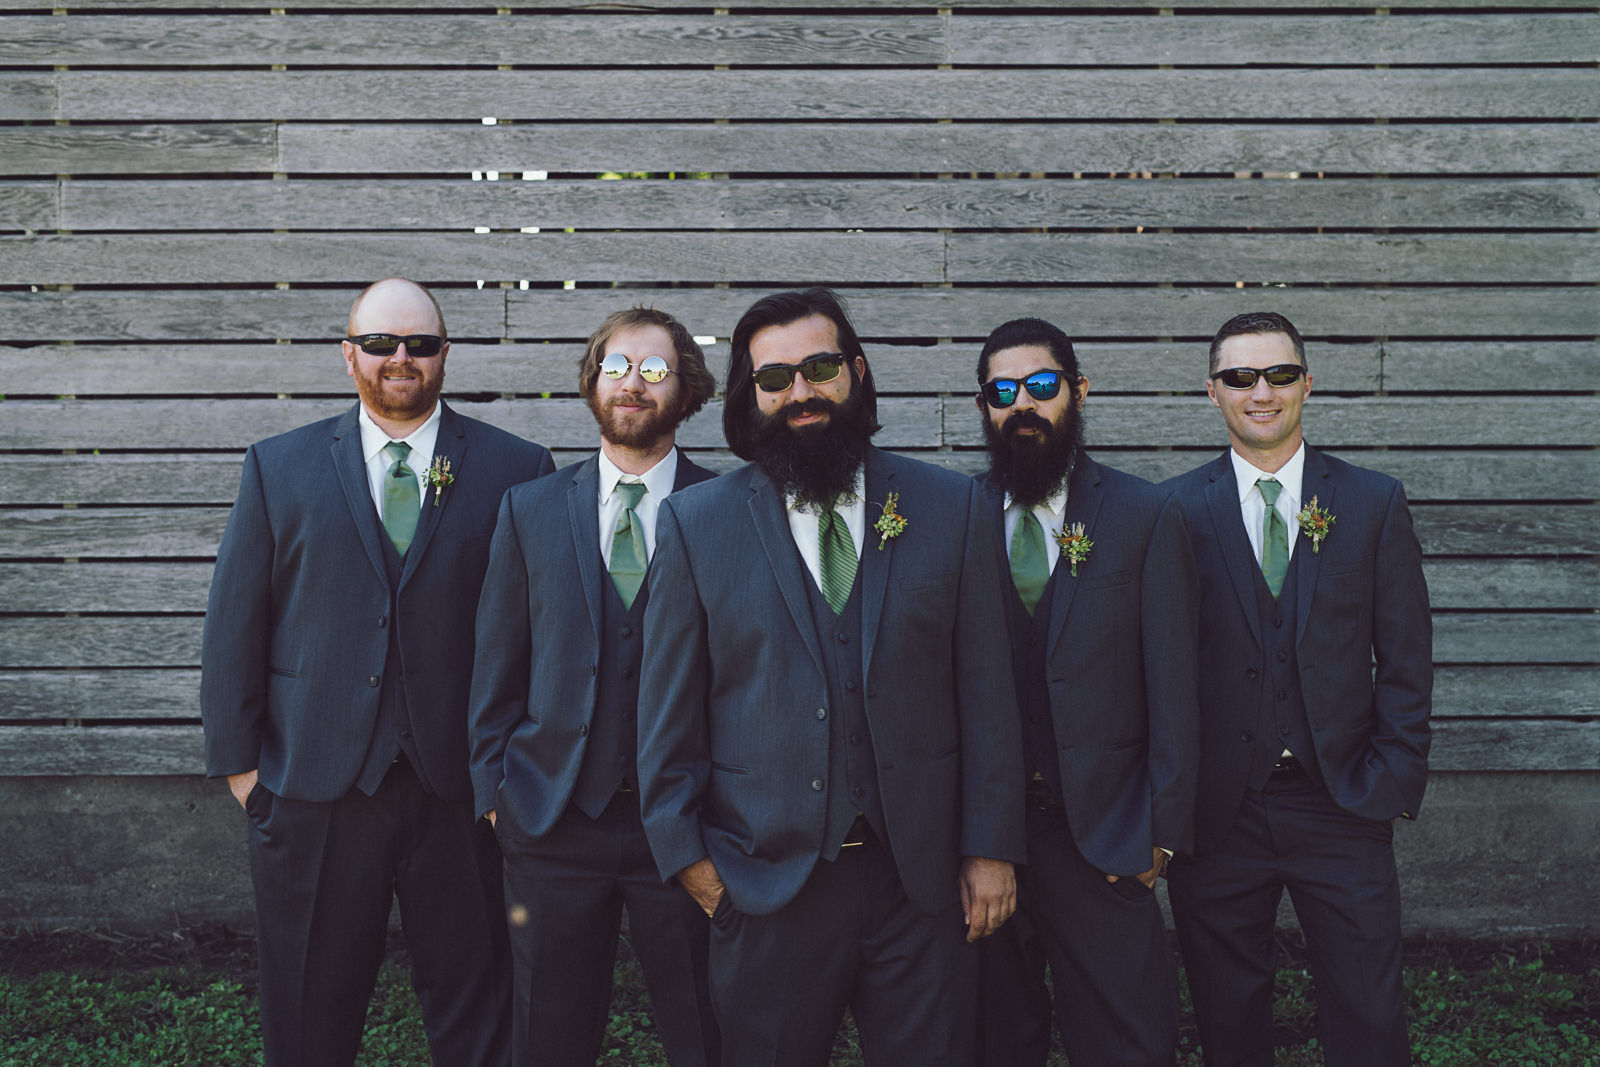 wedding-keely-caleb-701-name-your-photo.jpg